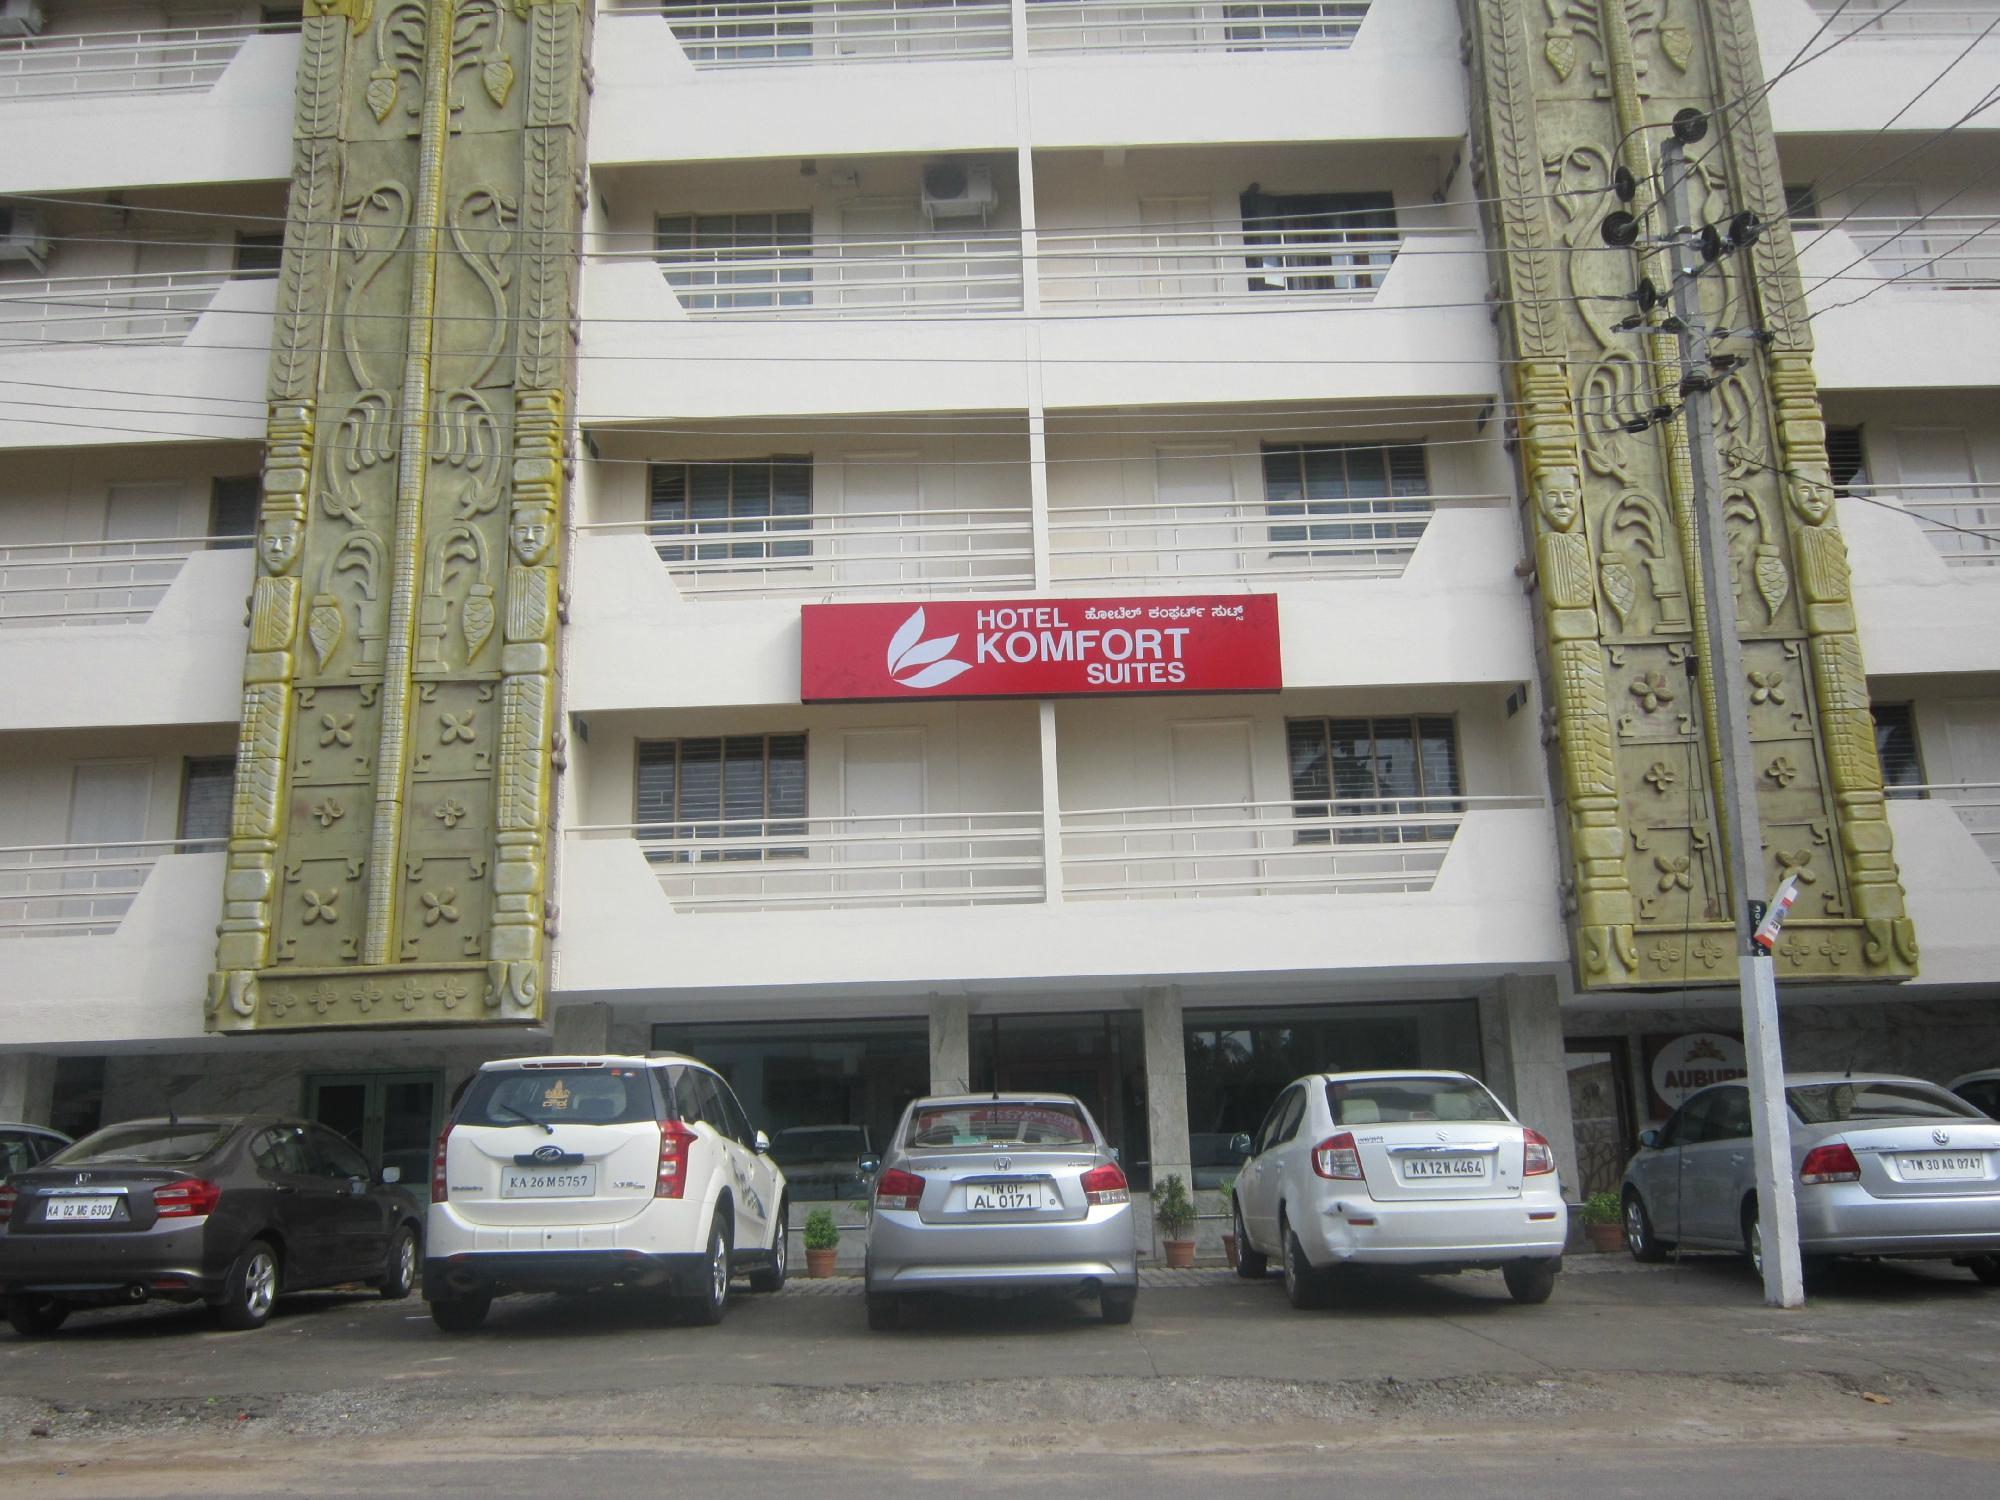 Hotel Komfort Suites